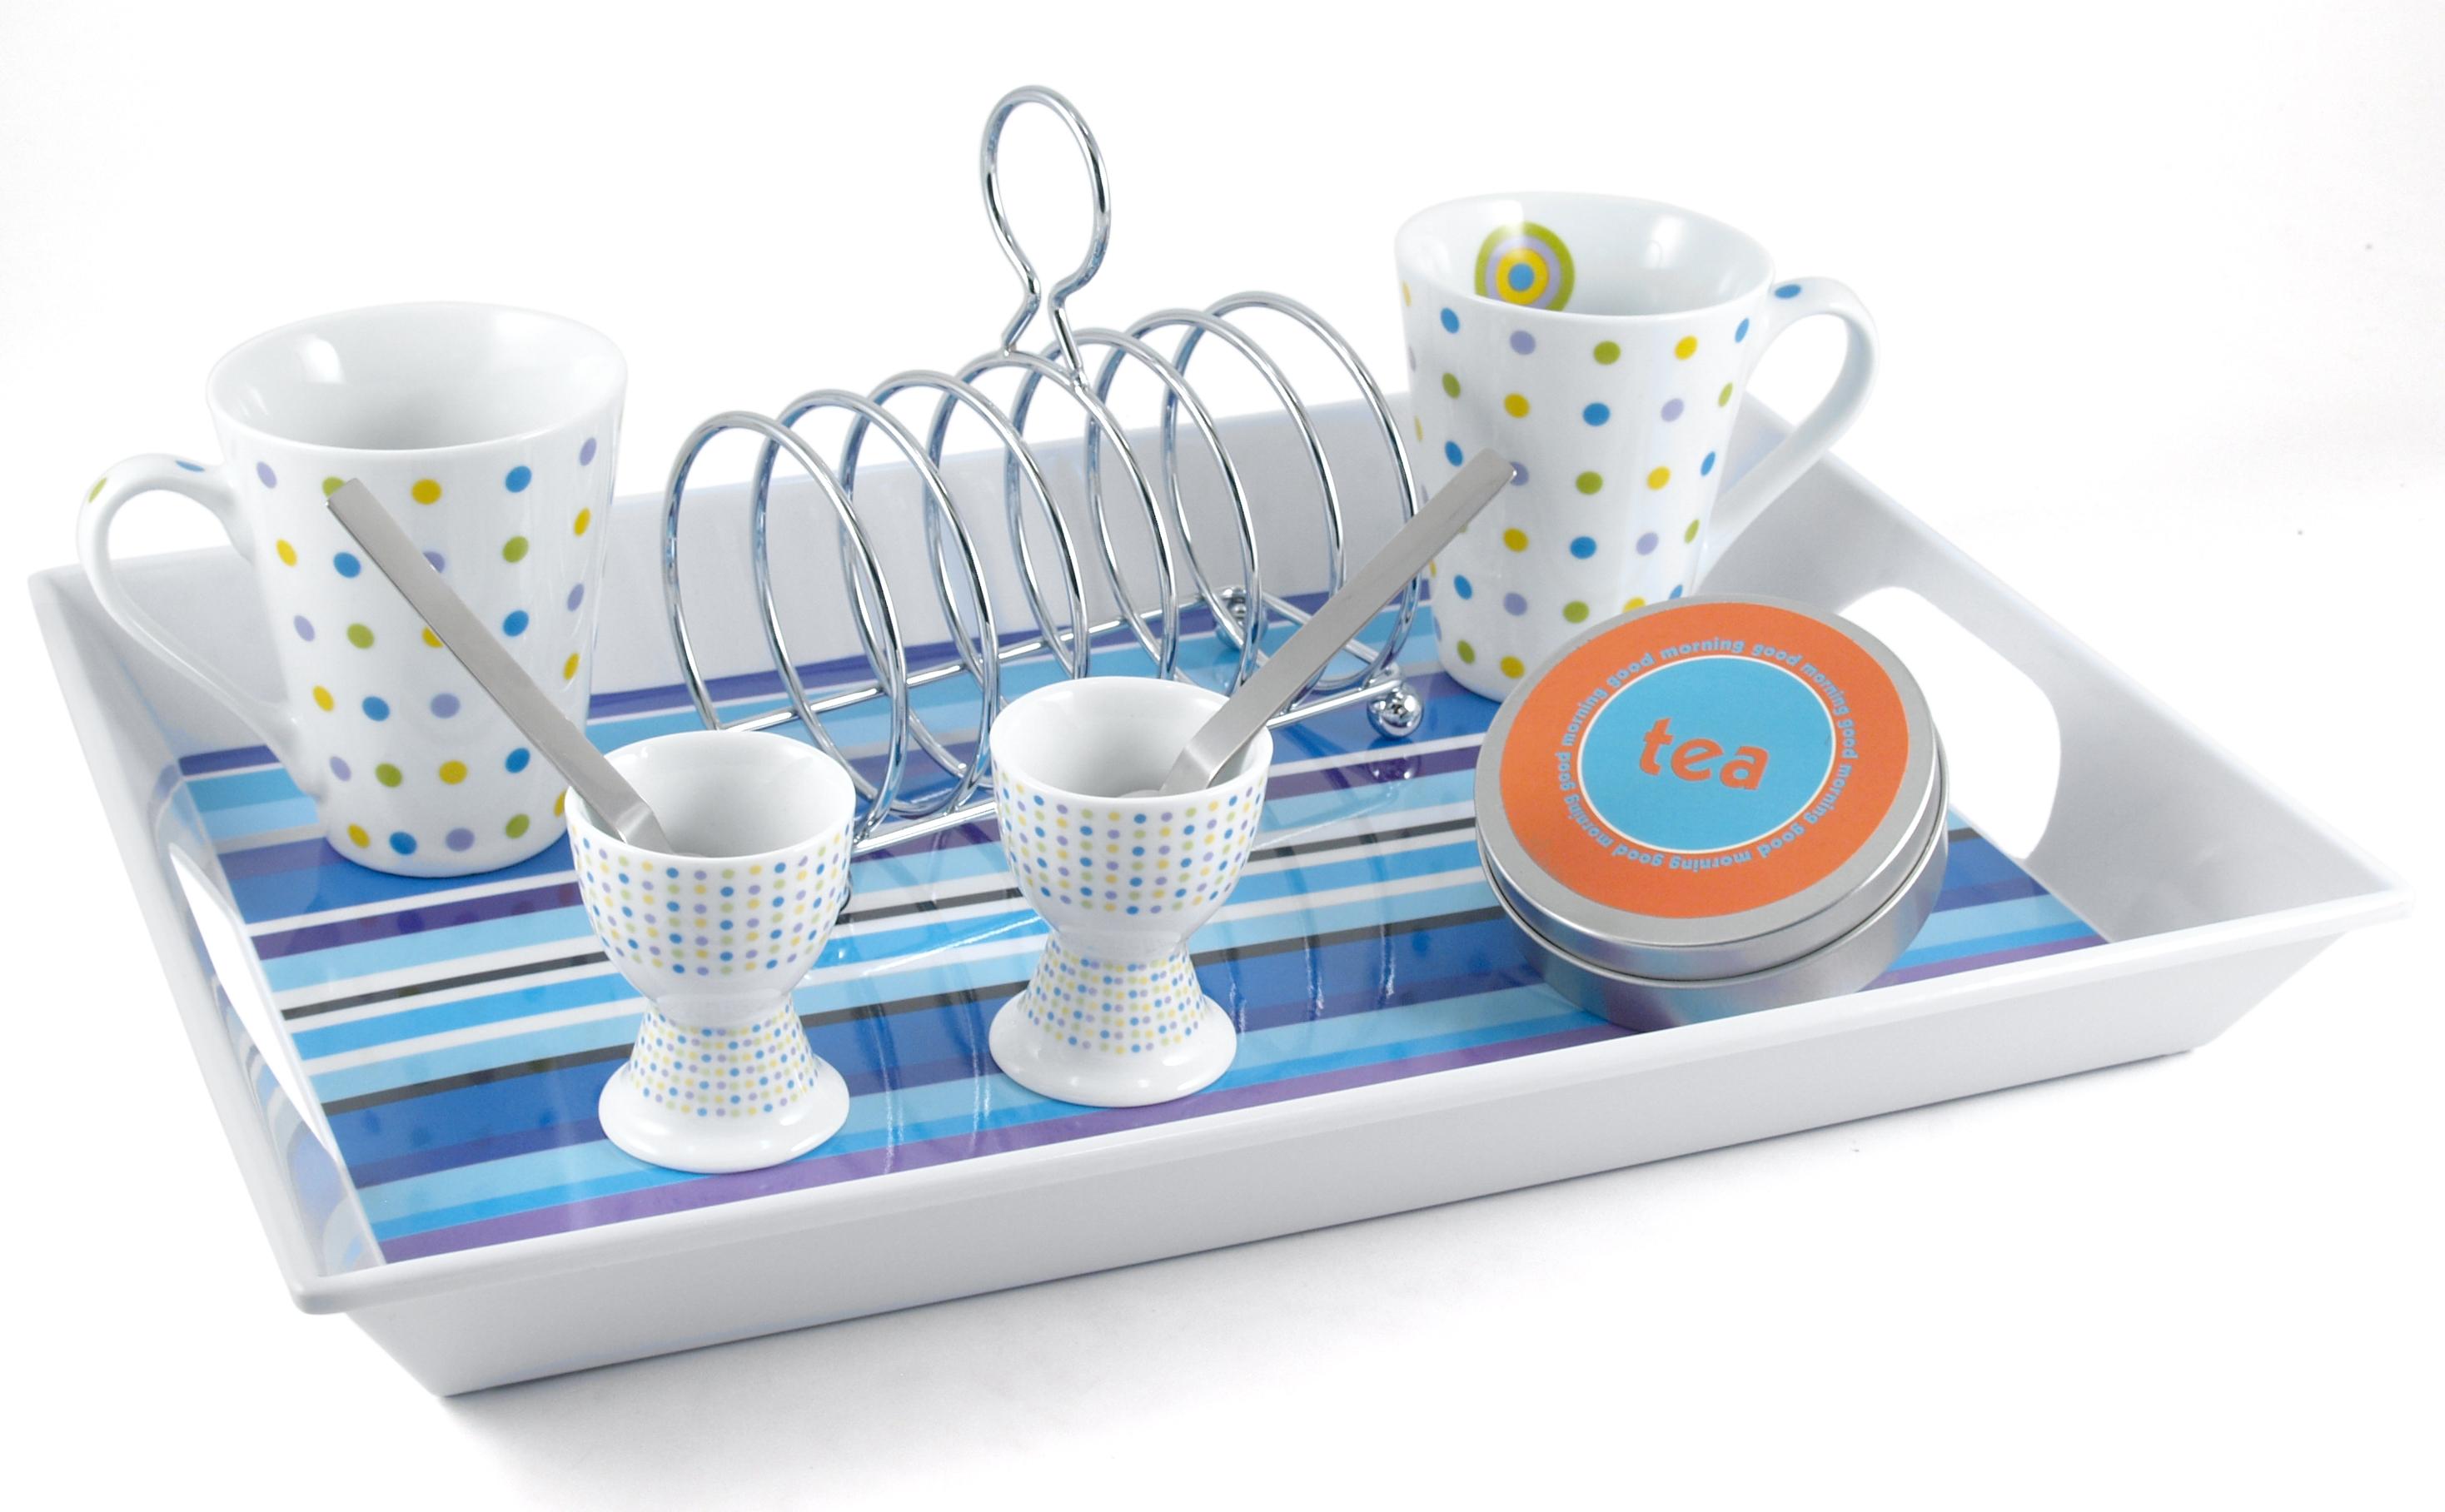 Typhoon Breakfast In Bed 6 Piece Gift Set